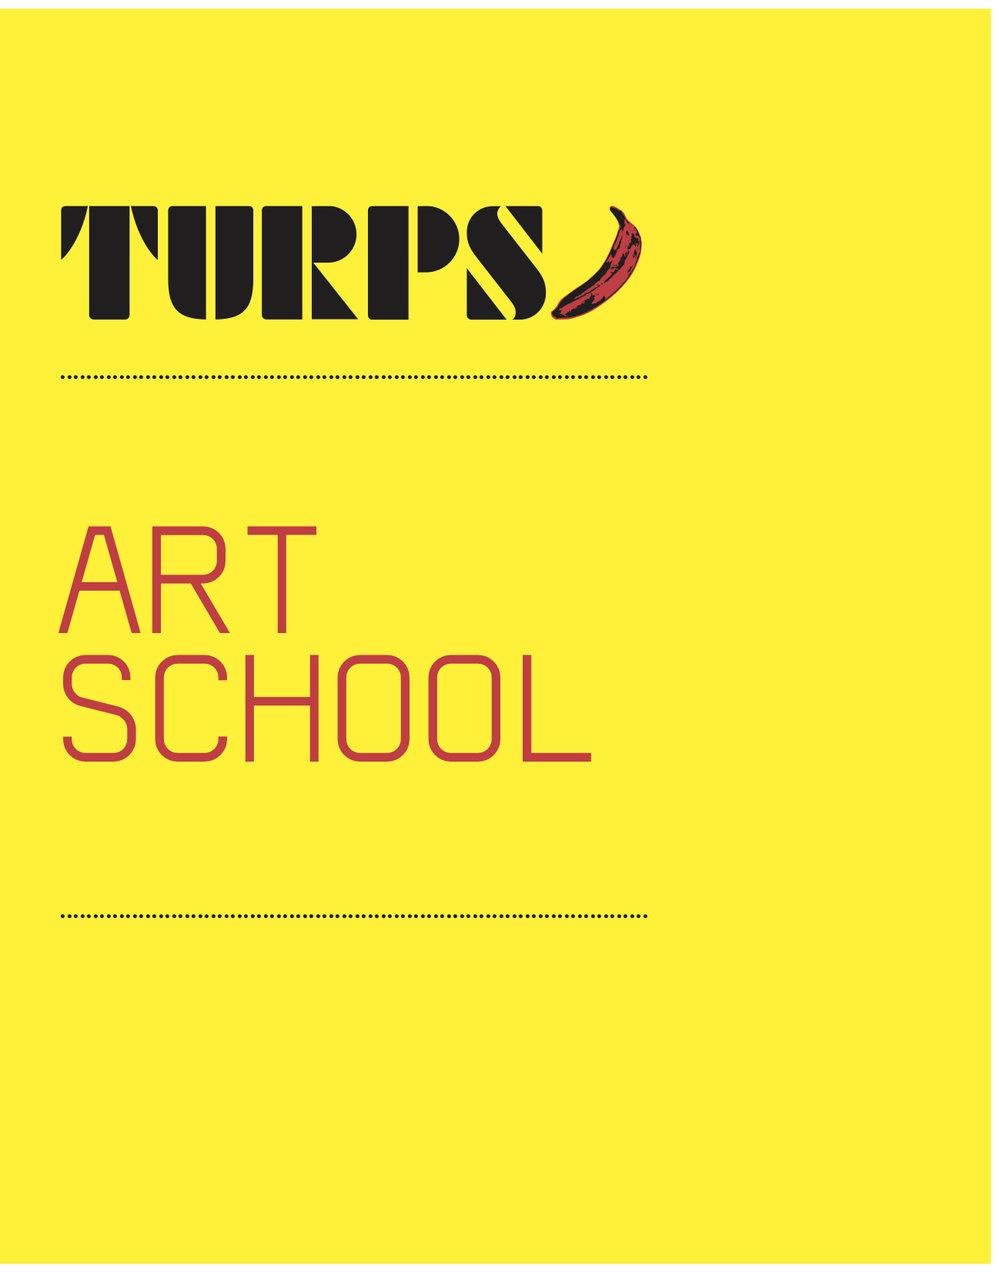 2 TURPS ART SCHOOL RED.jpg